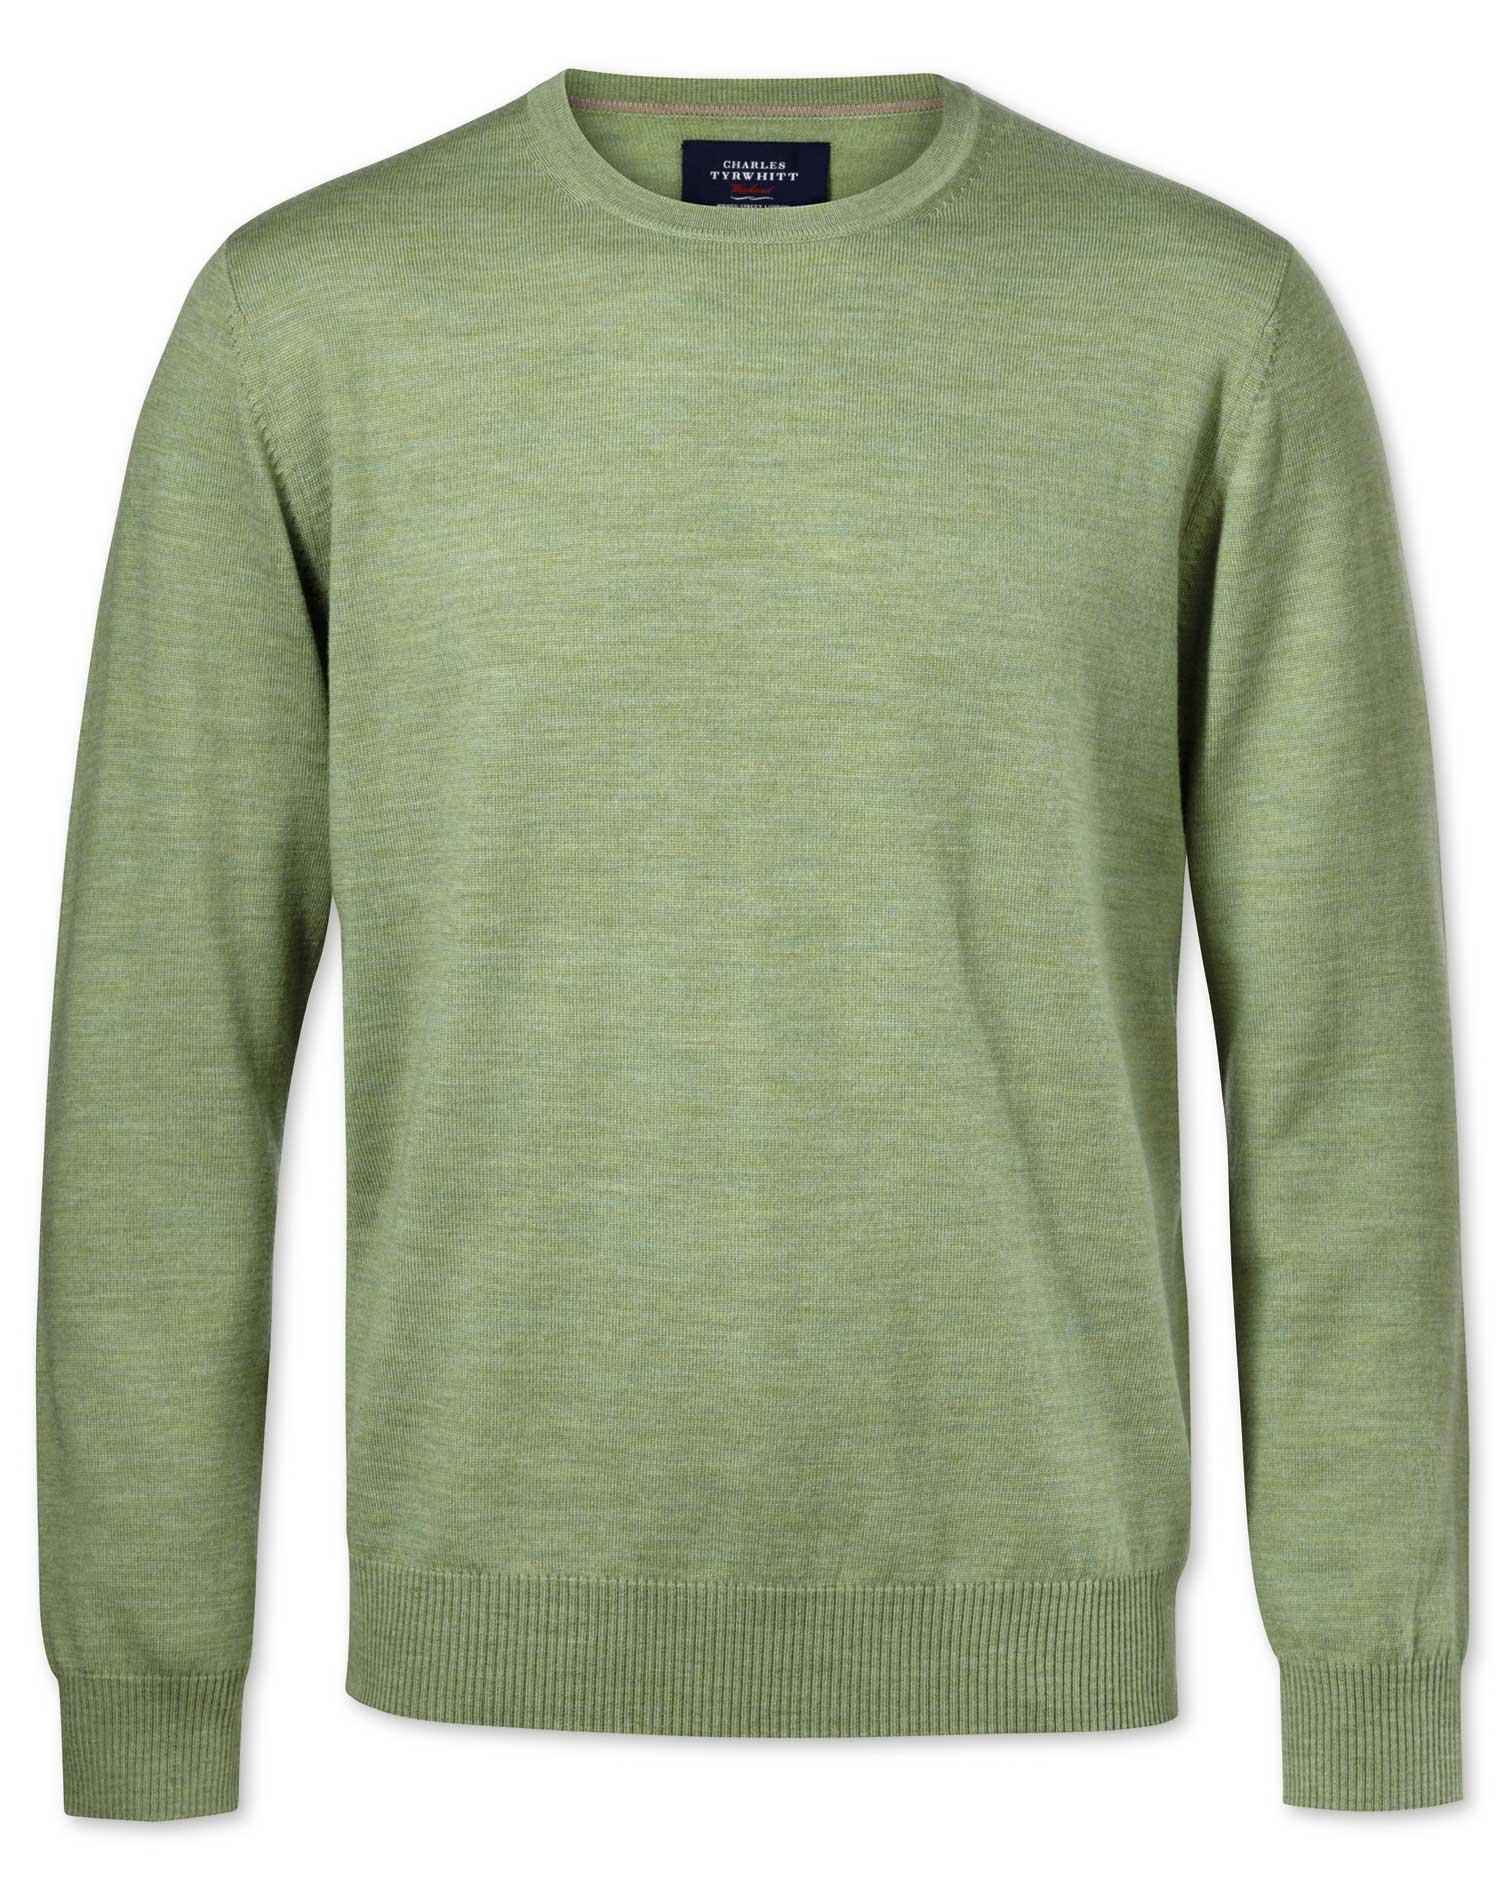 Light Green Merino Wool Crew Neck Jumper Size XXXL by Charles Tyrwhitt